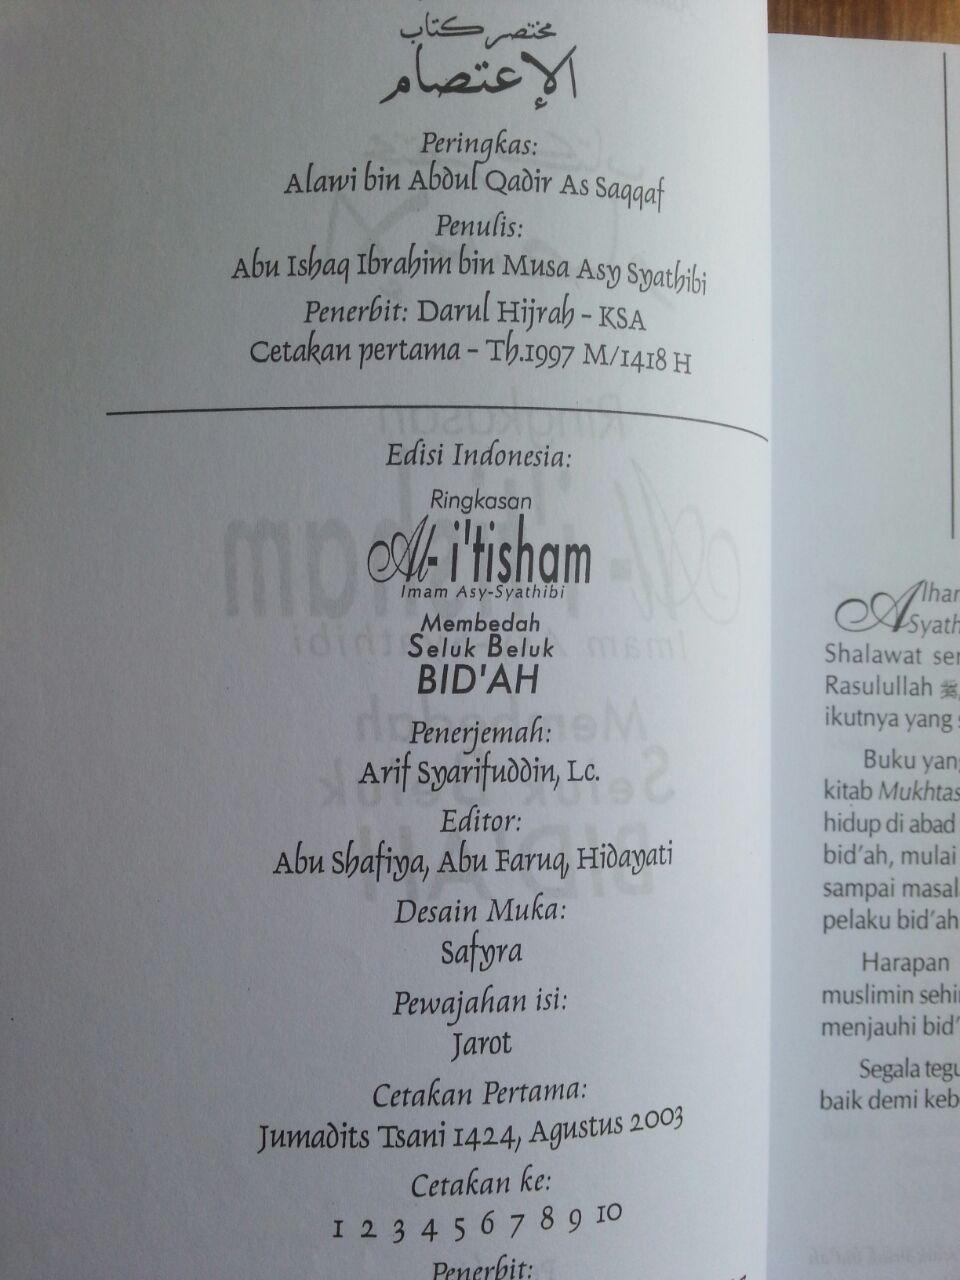 Buku Ringkasan Al-I'tisham (Membedah Seluk Beluk Bidah) isi